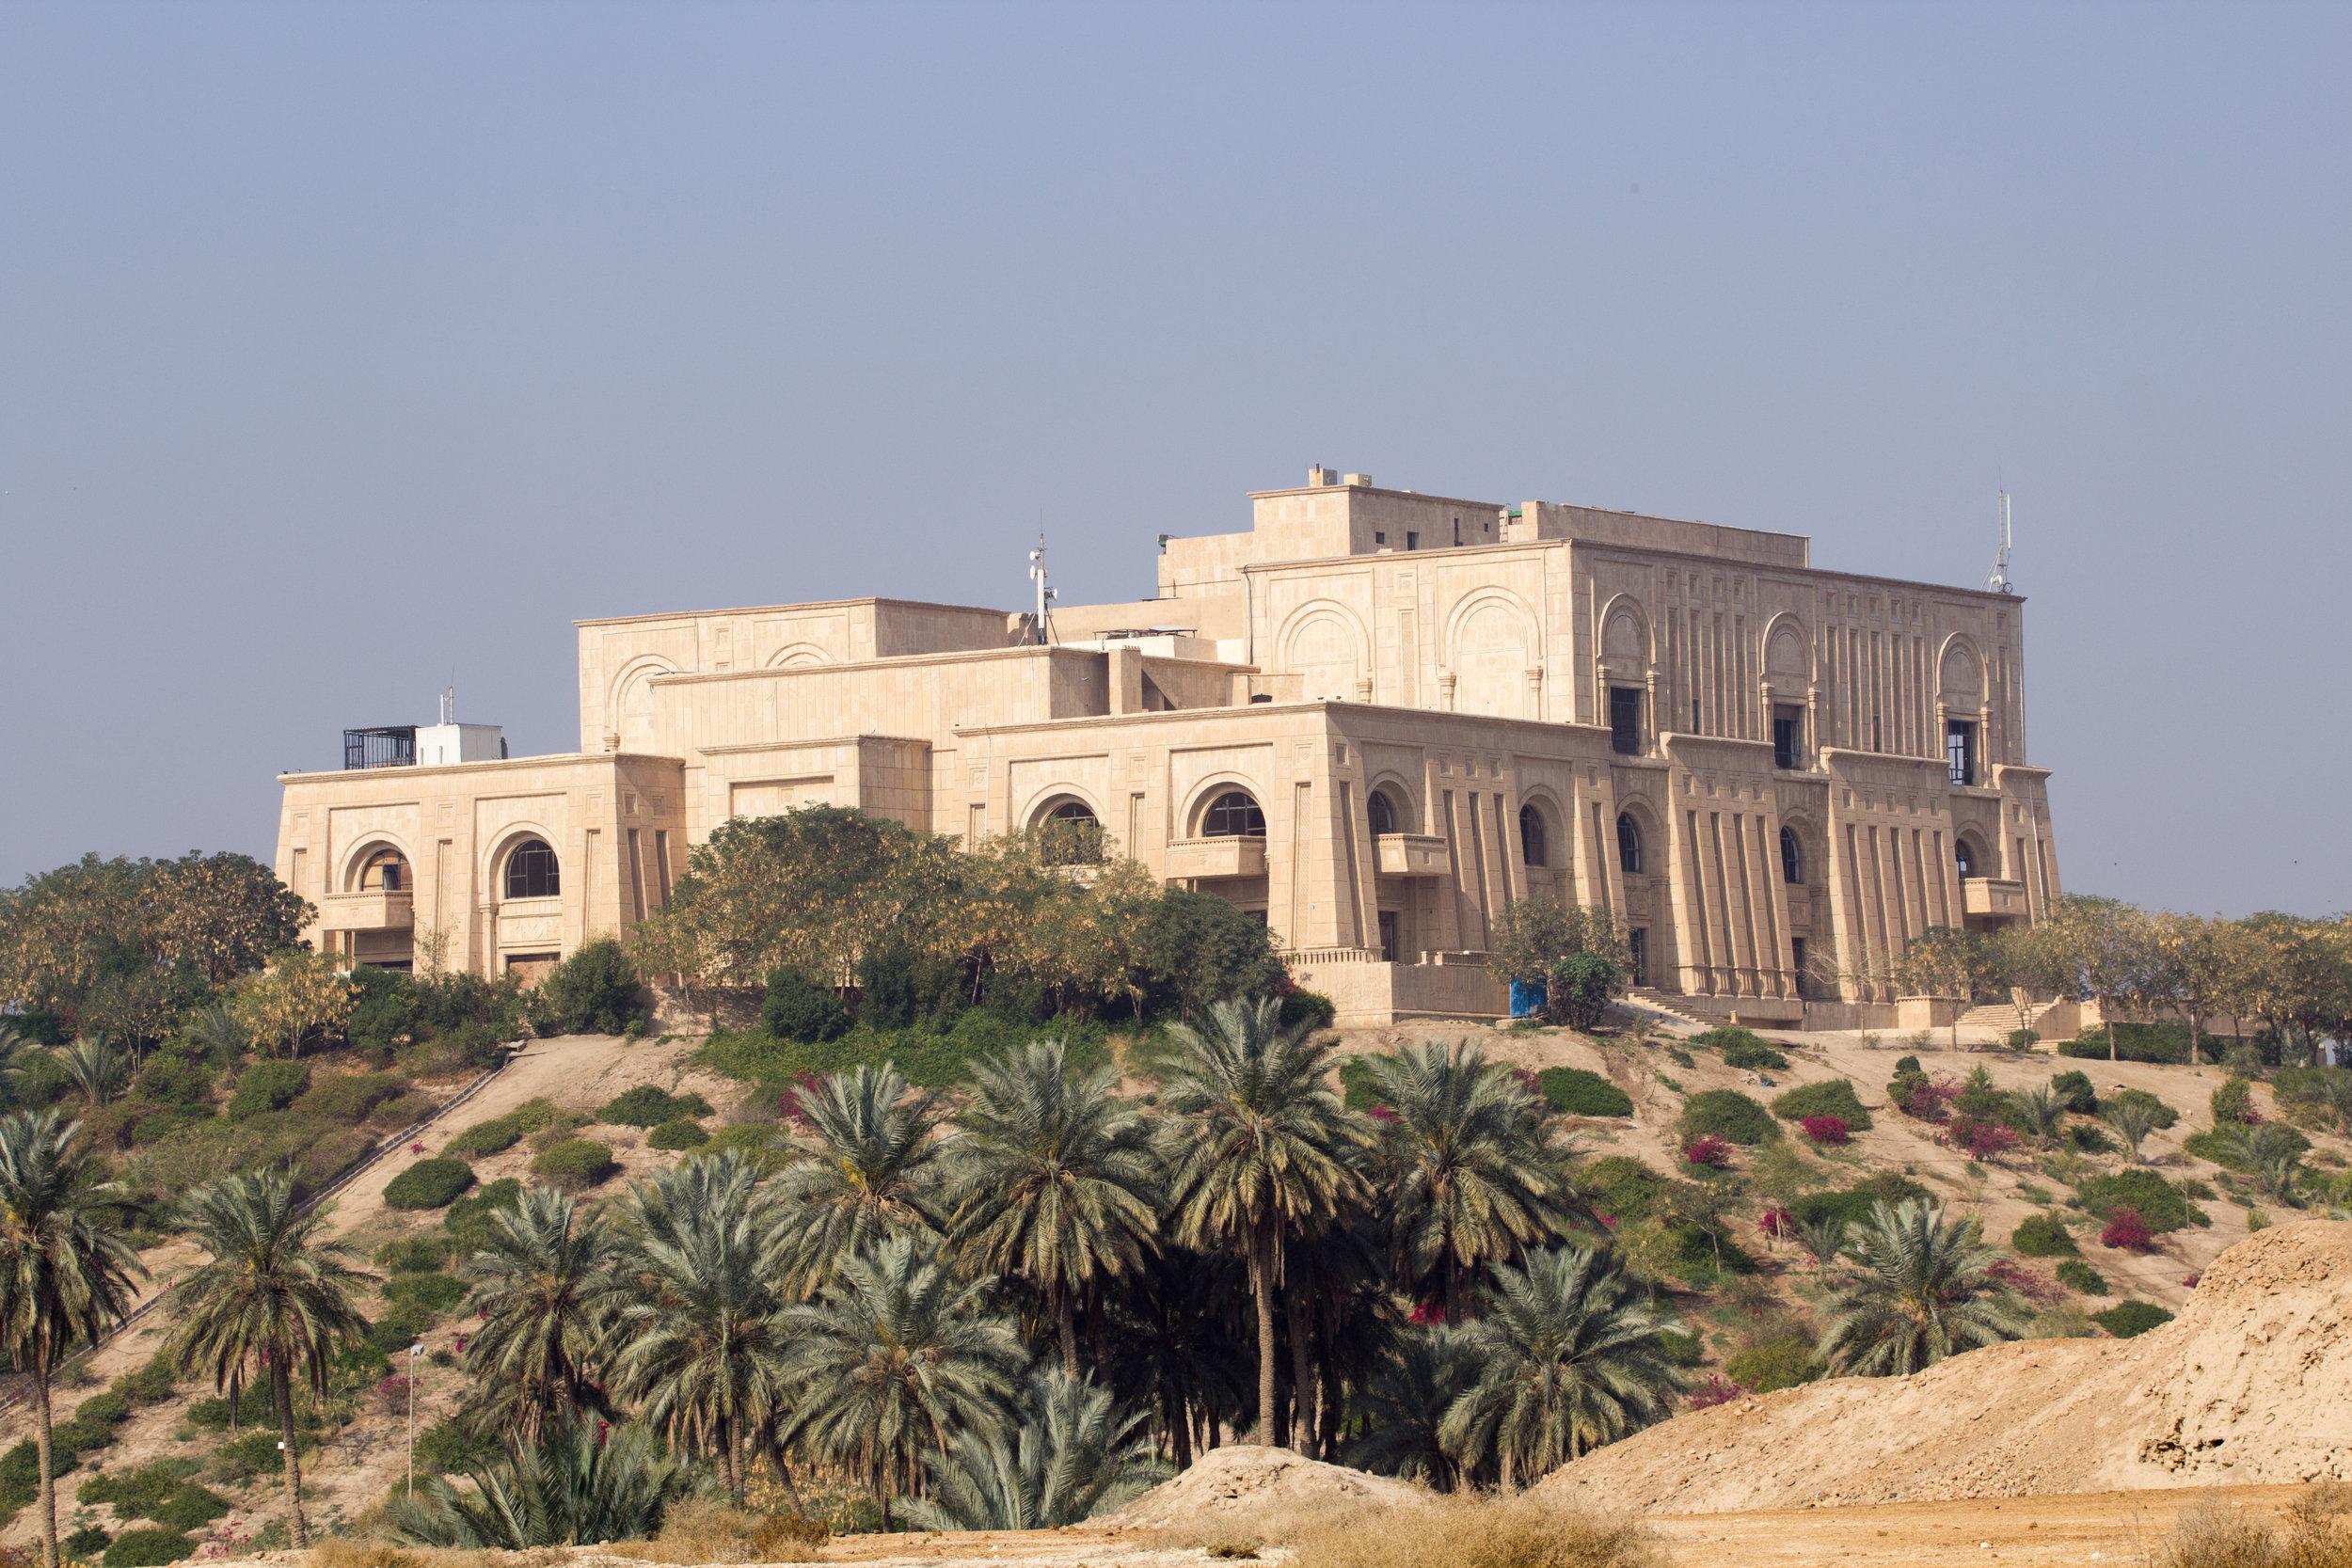 bigstock-Saddam-s-Babylon-Palace-86224805.jpg